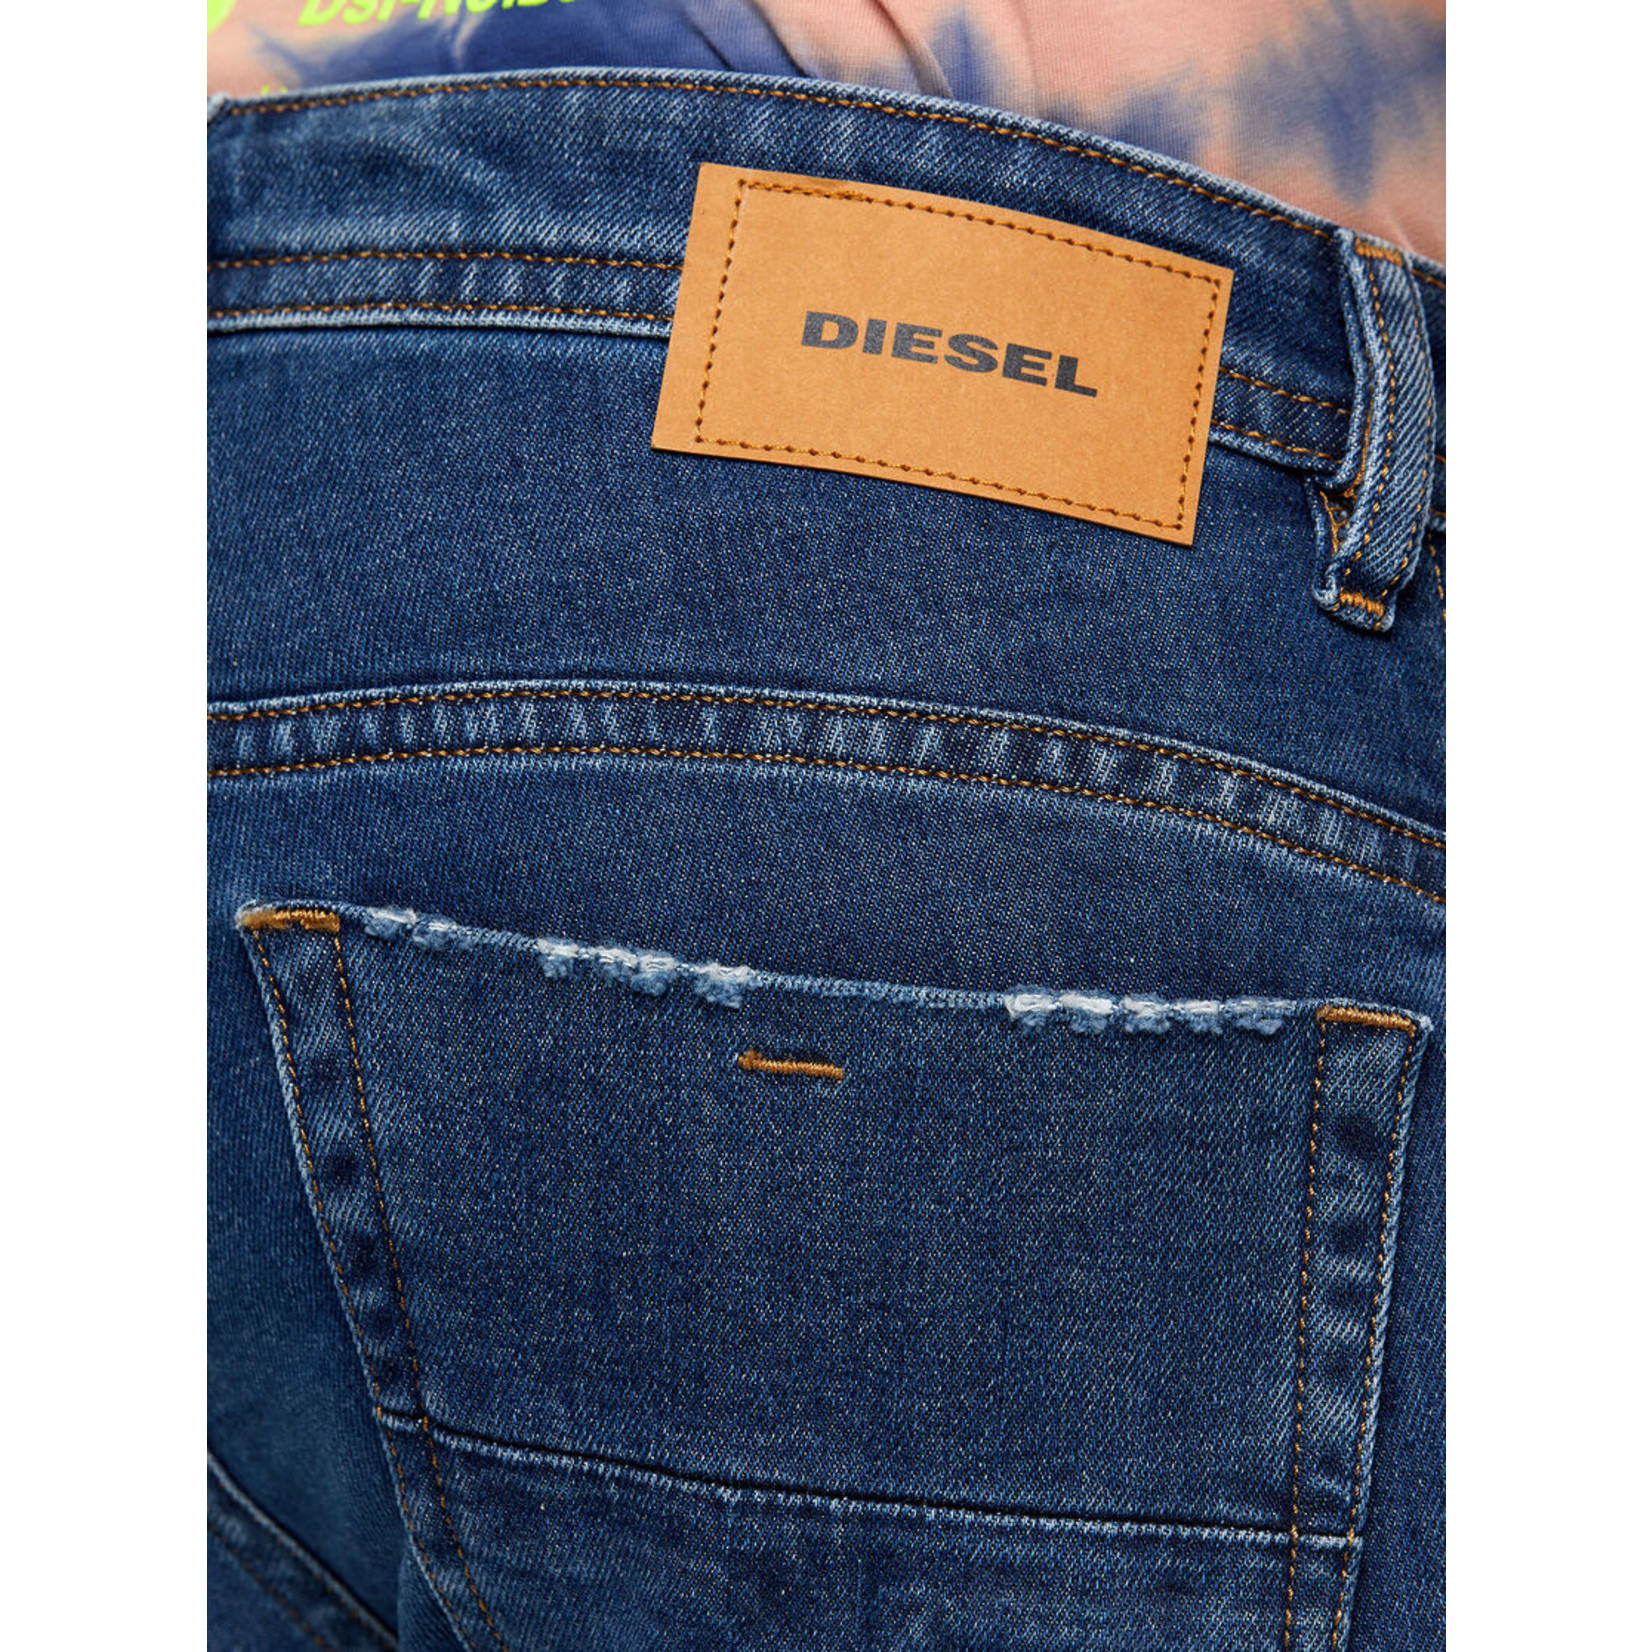 DIESEL DIESEL JEANS THOMMER X 009DE - DARK BLUE